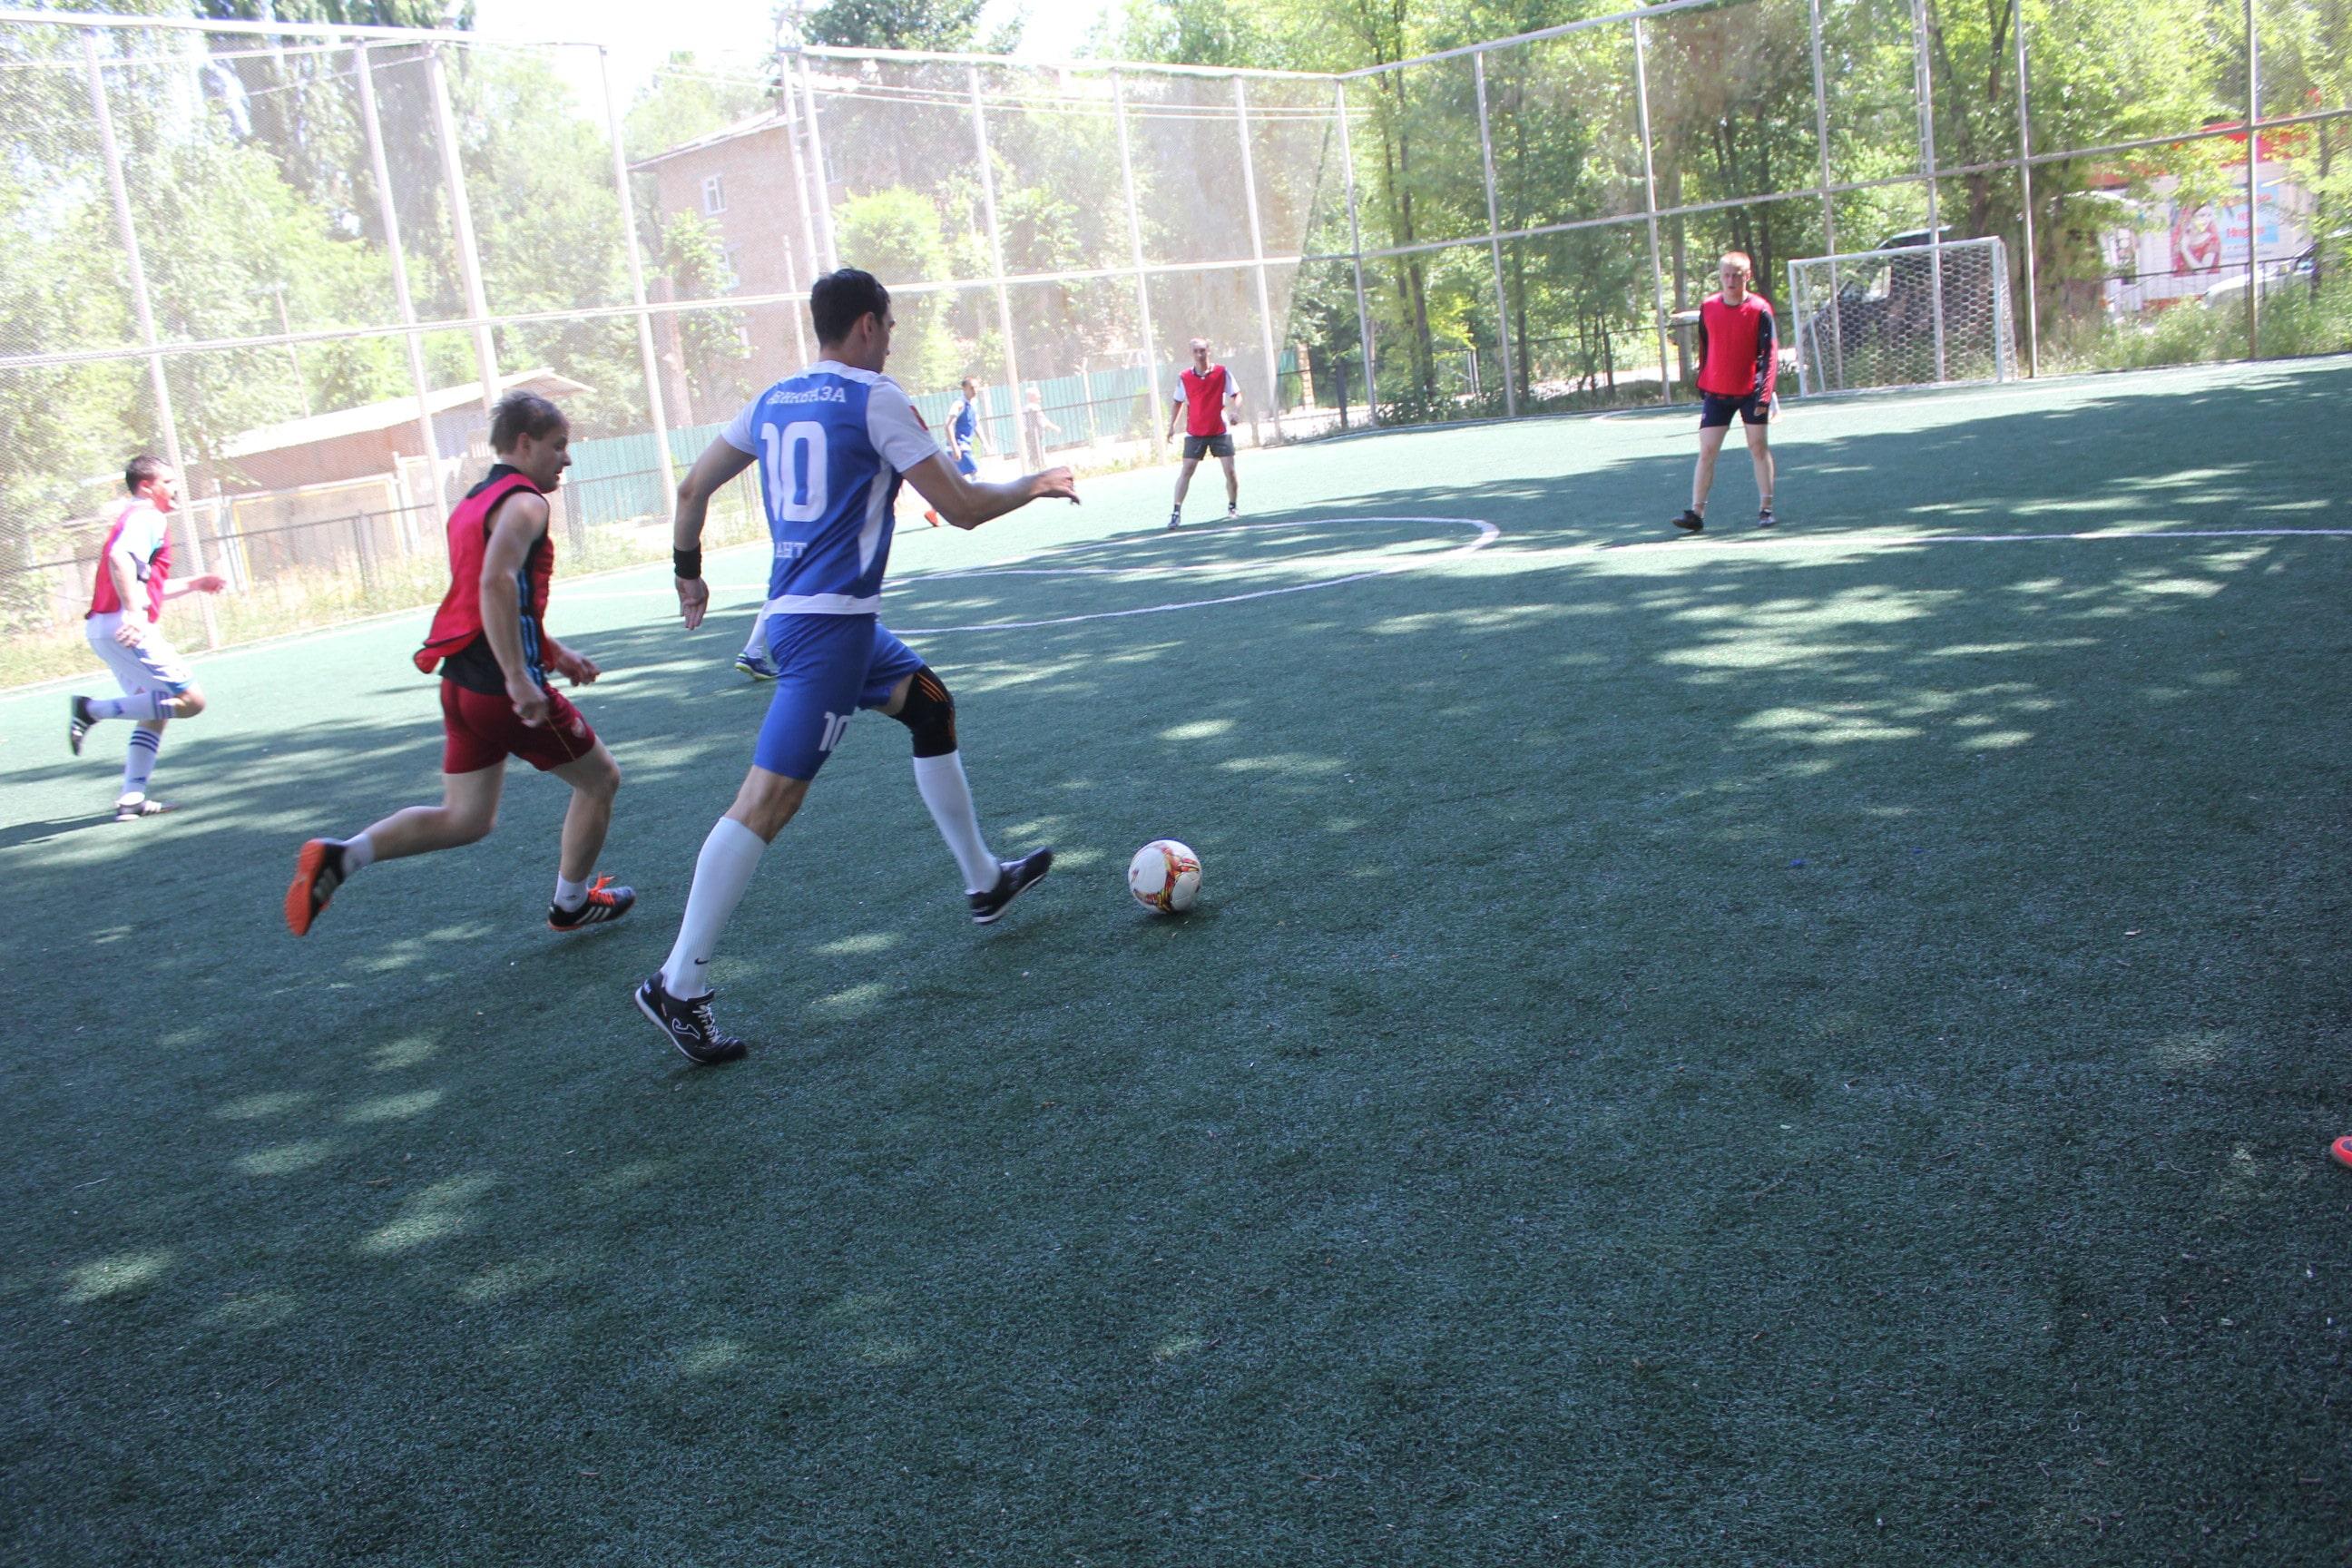 Турнир по мини-футболу в ознаменование Дня России